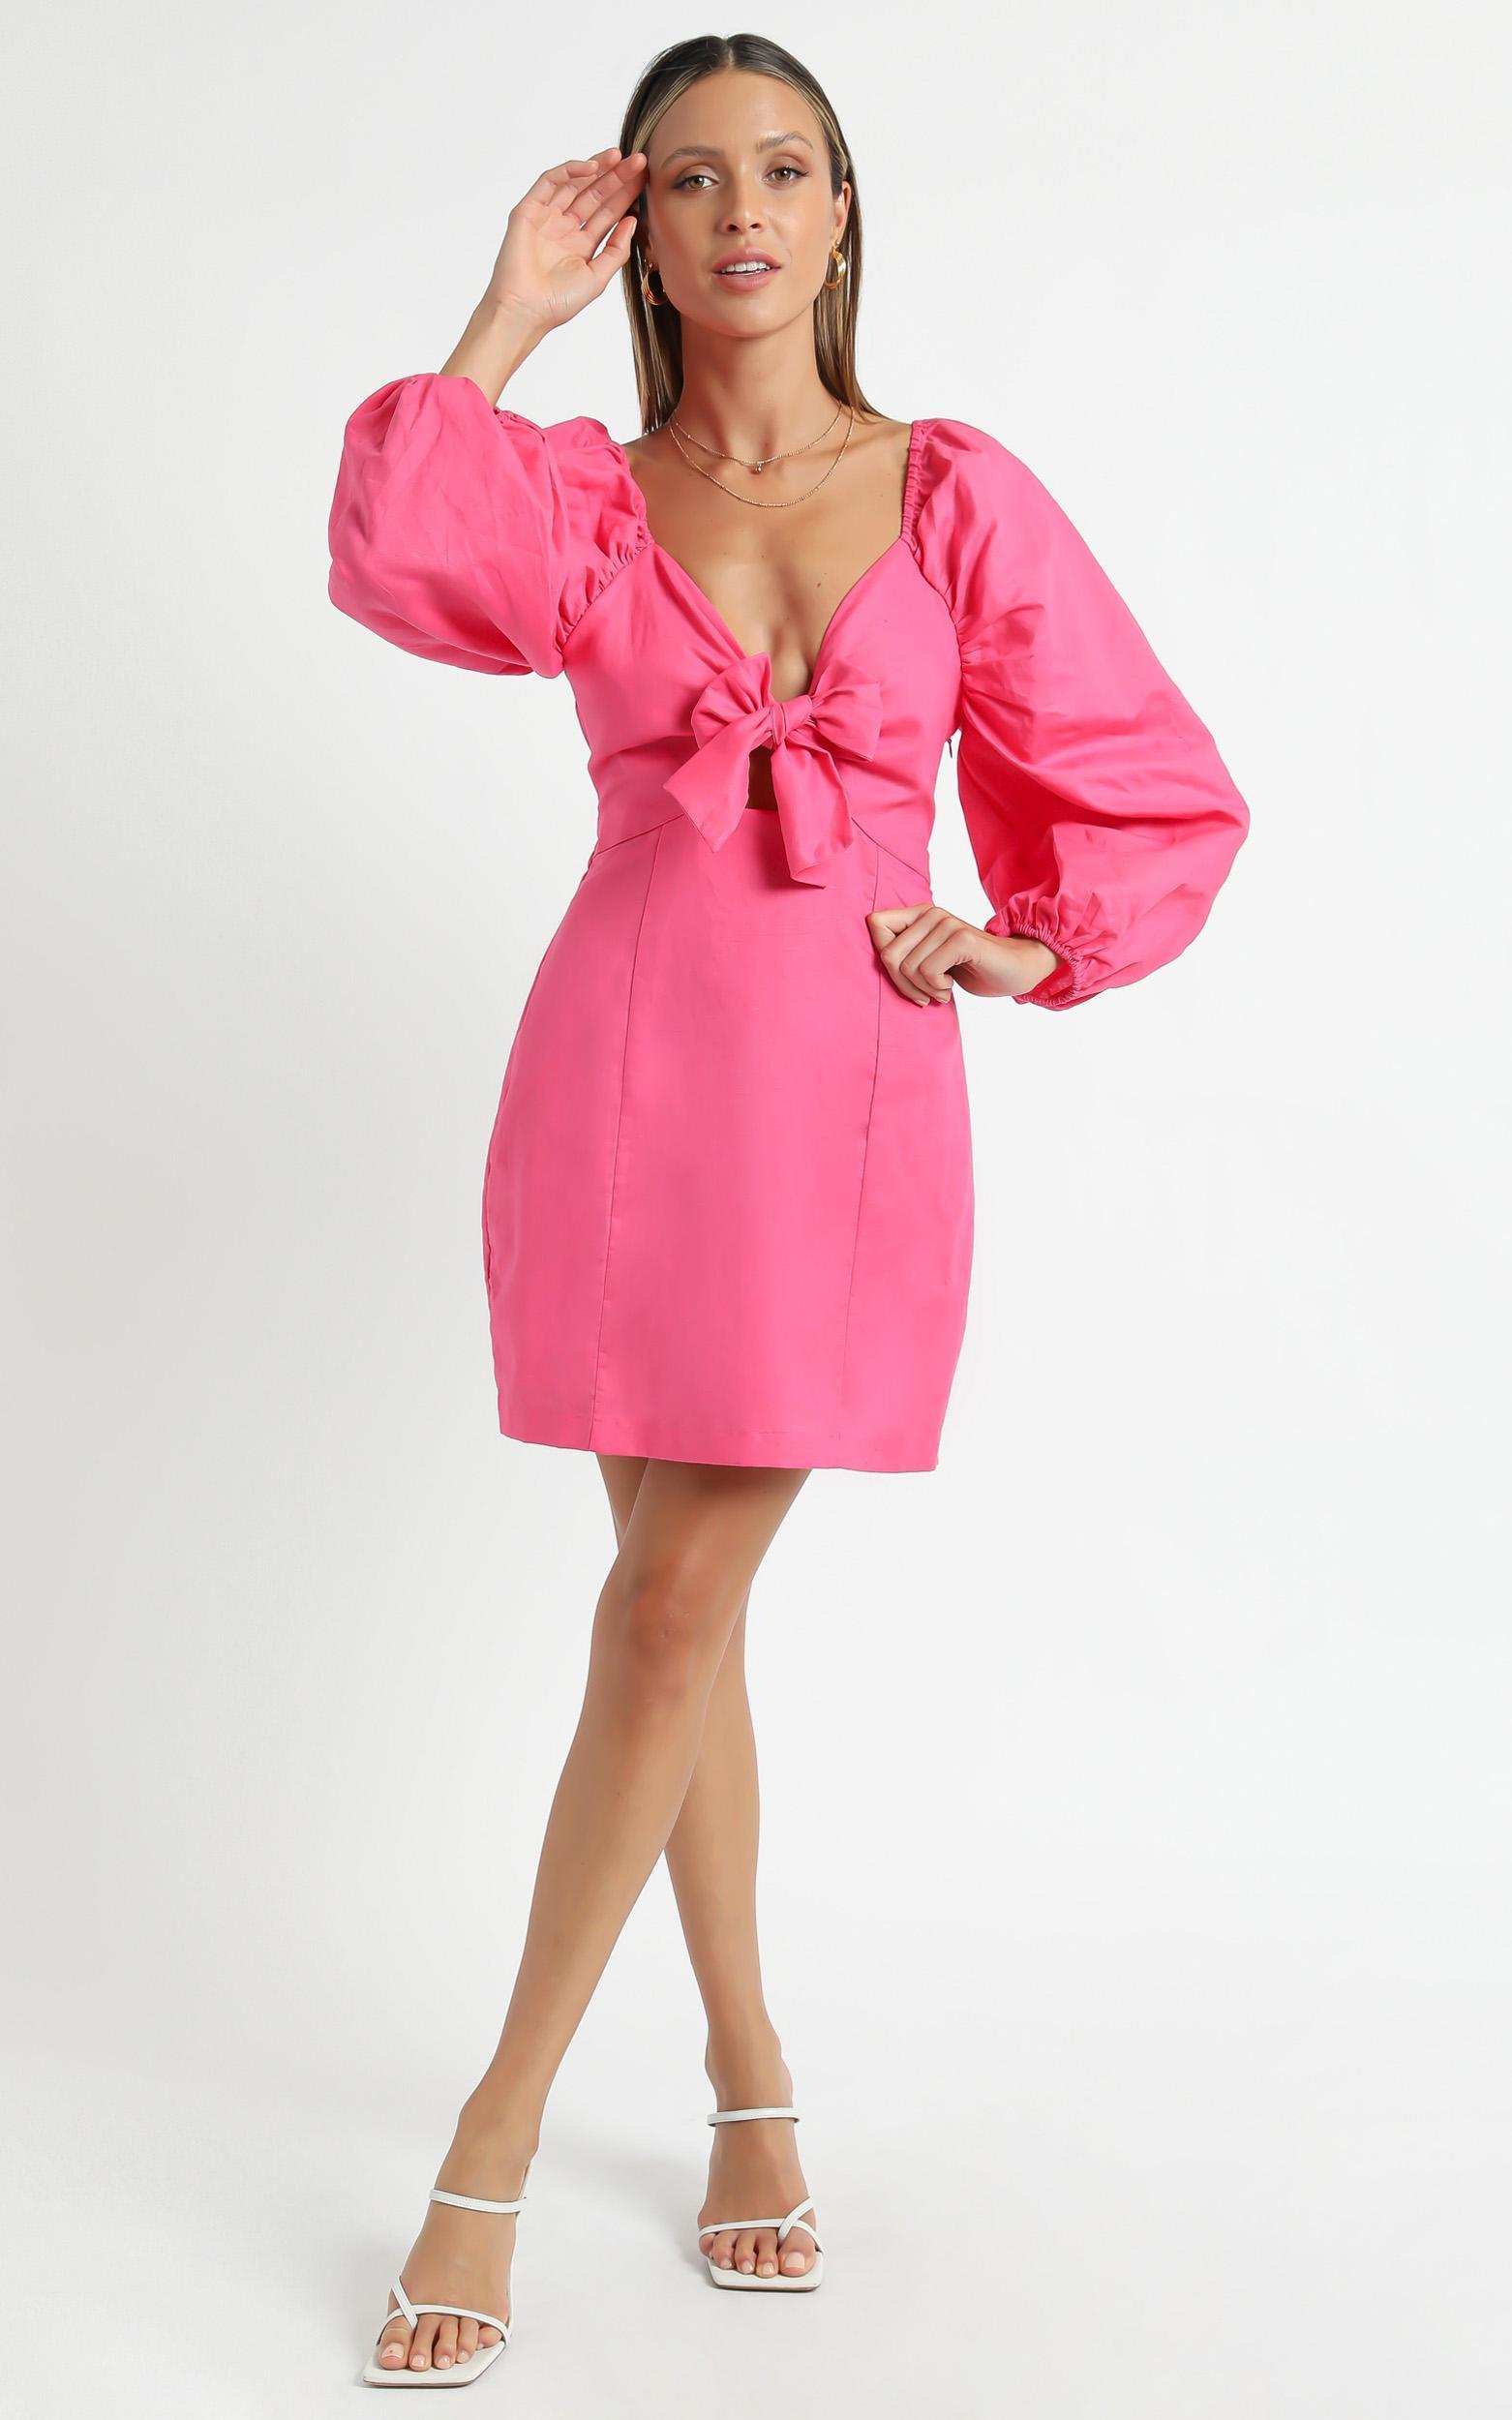 Minkpink - Aubrey Mini Dress in Hot Pink - XS, Pink, hi-res image number null